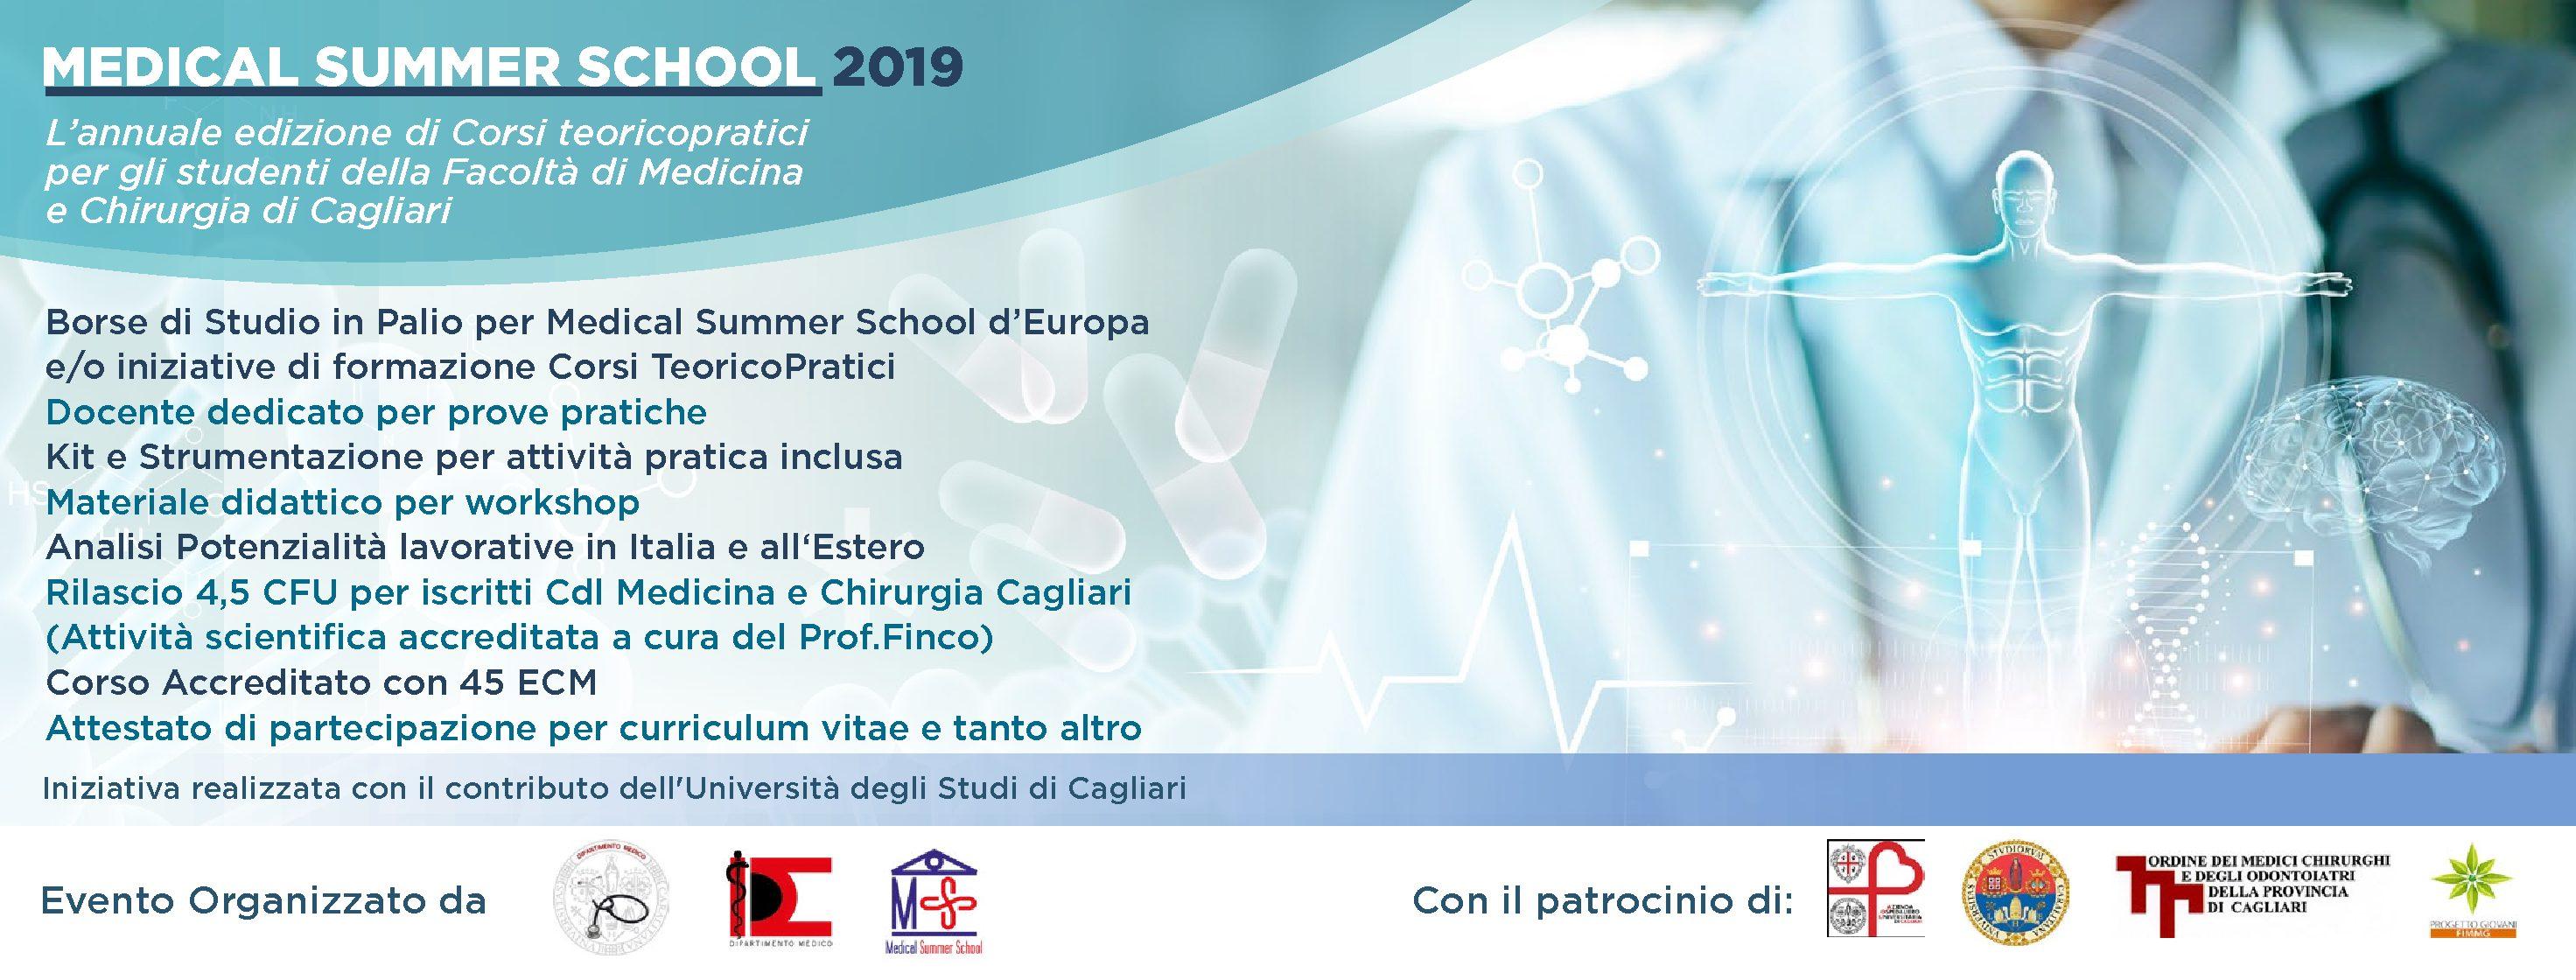 Medical Summer School 2019 – University of Cagliari